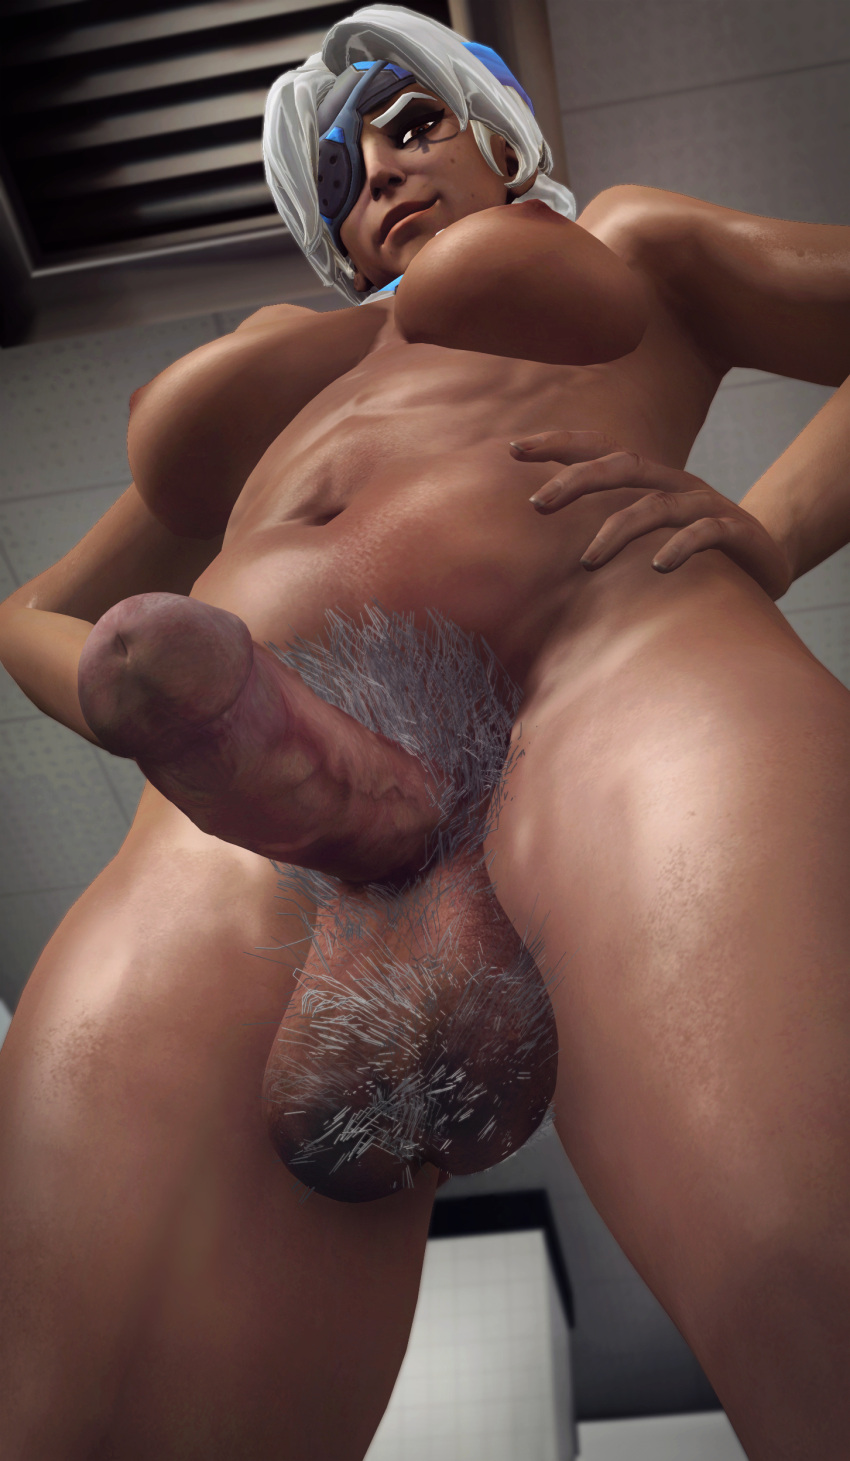 overwatch-porn-–-thighs,-futanari,-large-breasts,-hands-on-hips,-xnalara,-testicles.